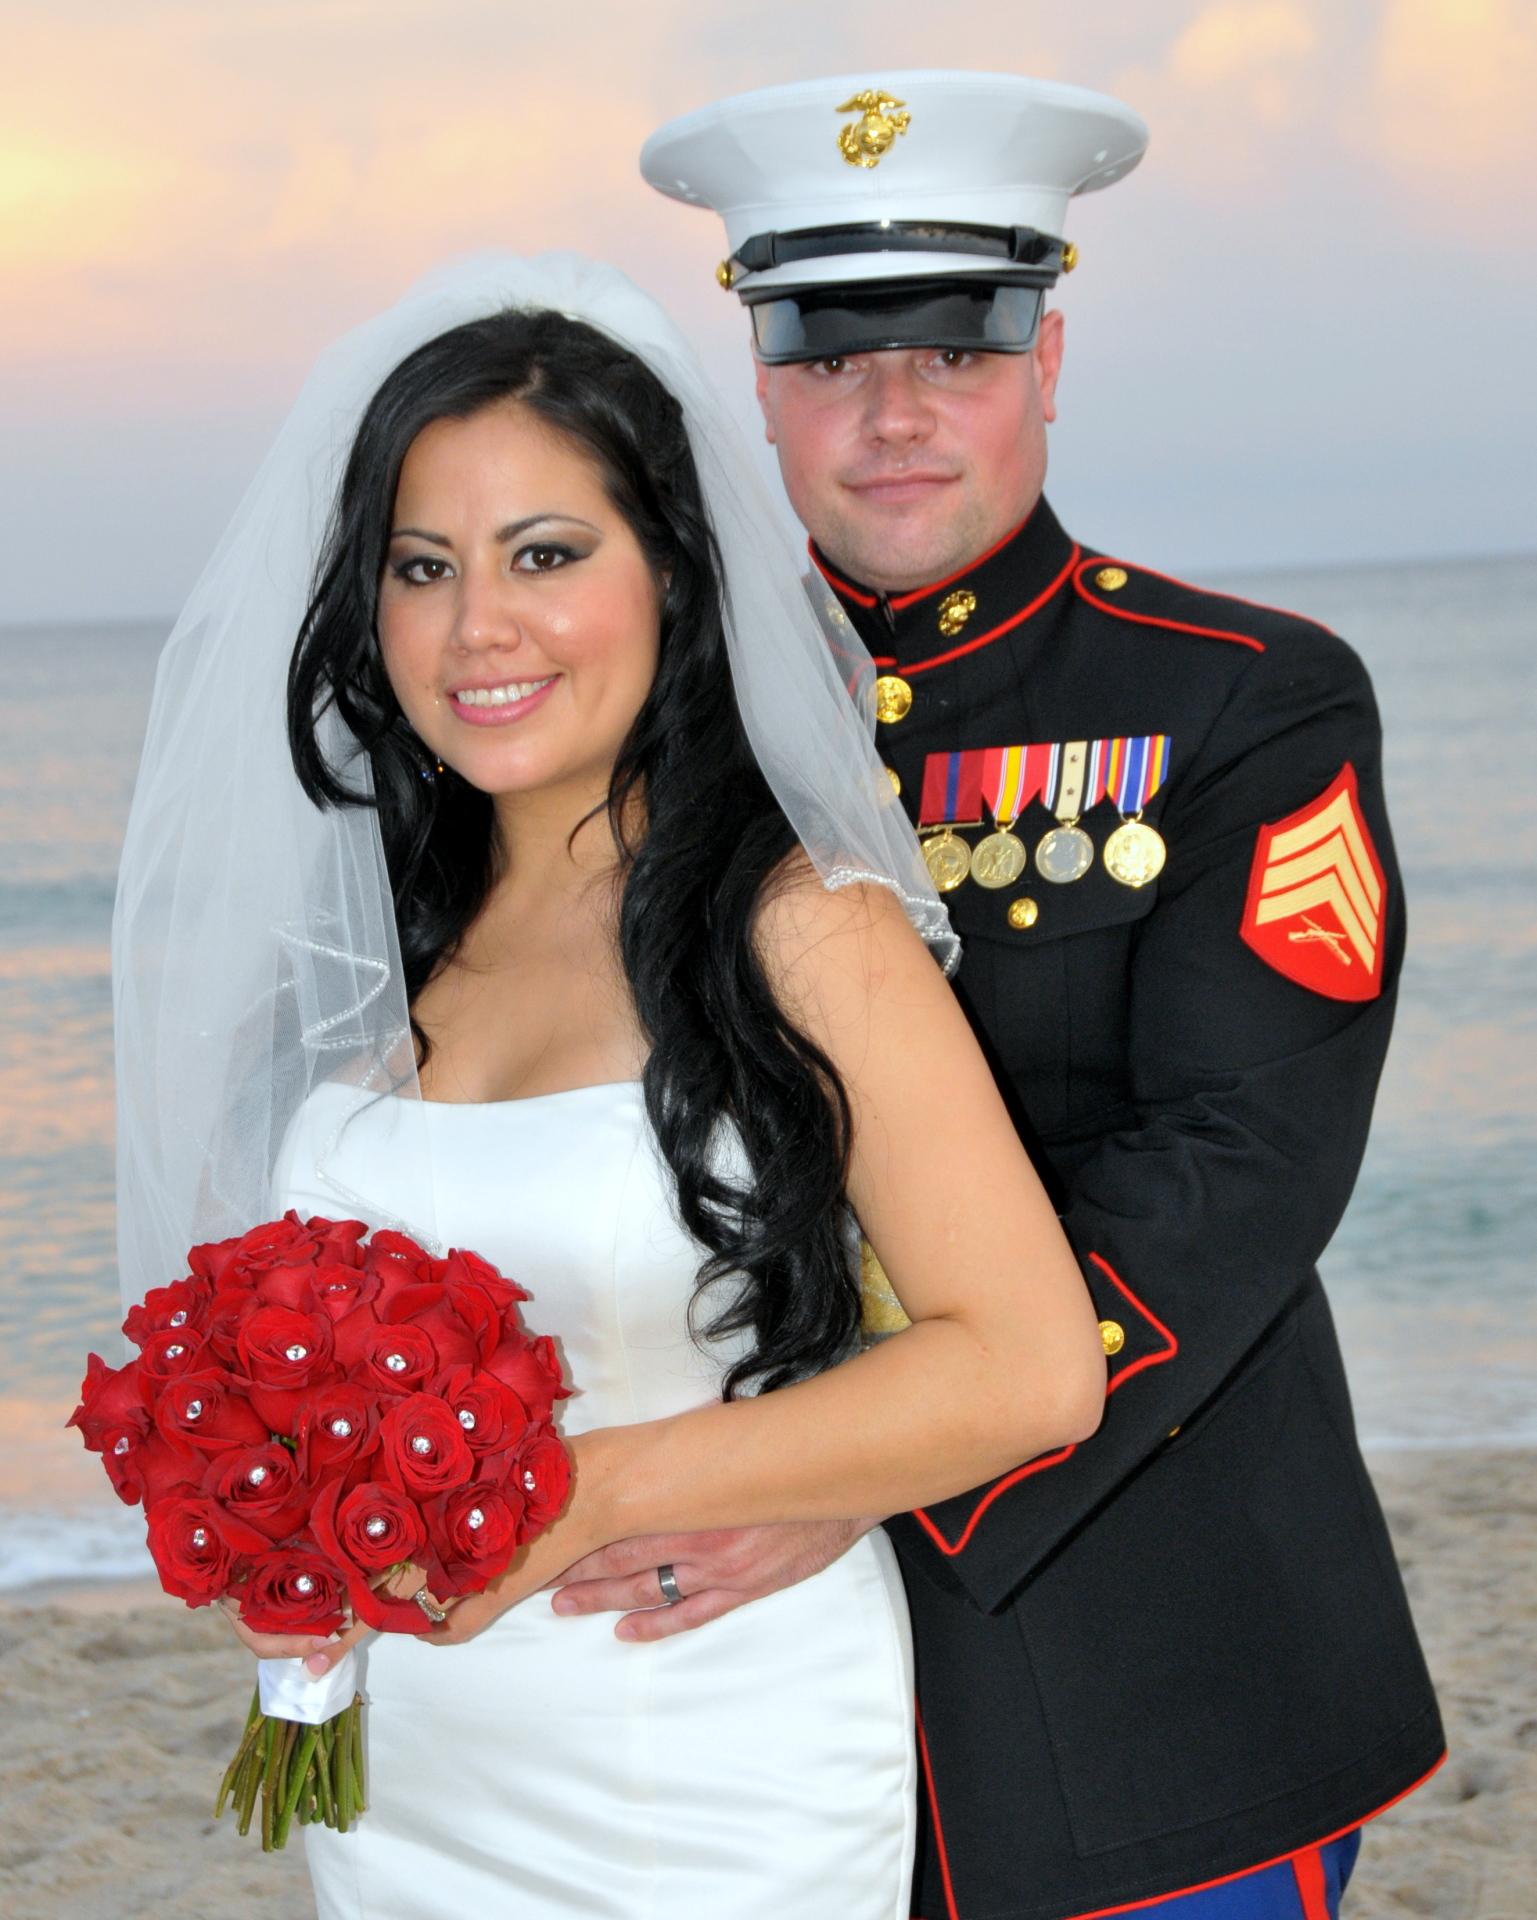 wedding, photos, engagement, destination wedding, boca raton, jewish wedding, ethnic wedding